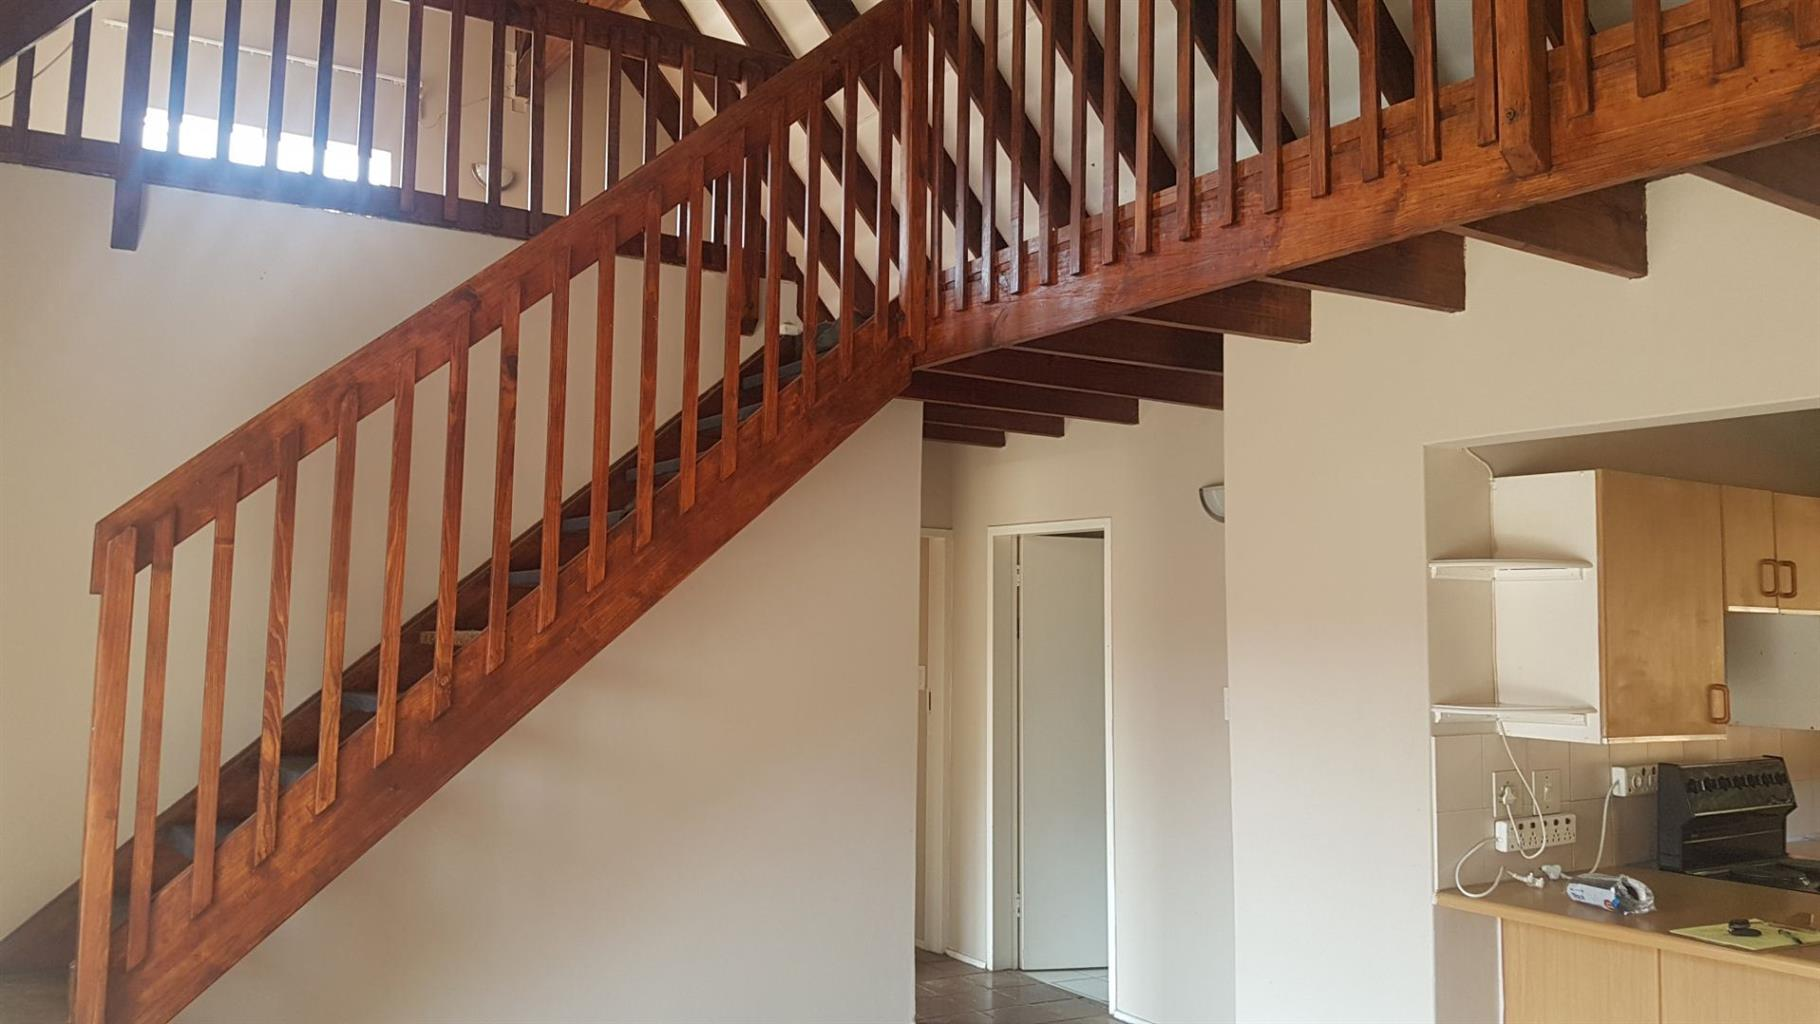 Townhouse Rental Monthly in WEAVIND PARK